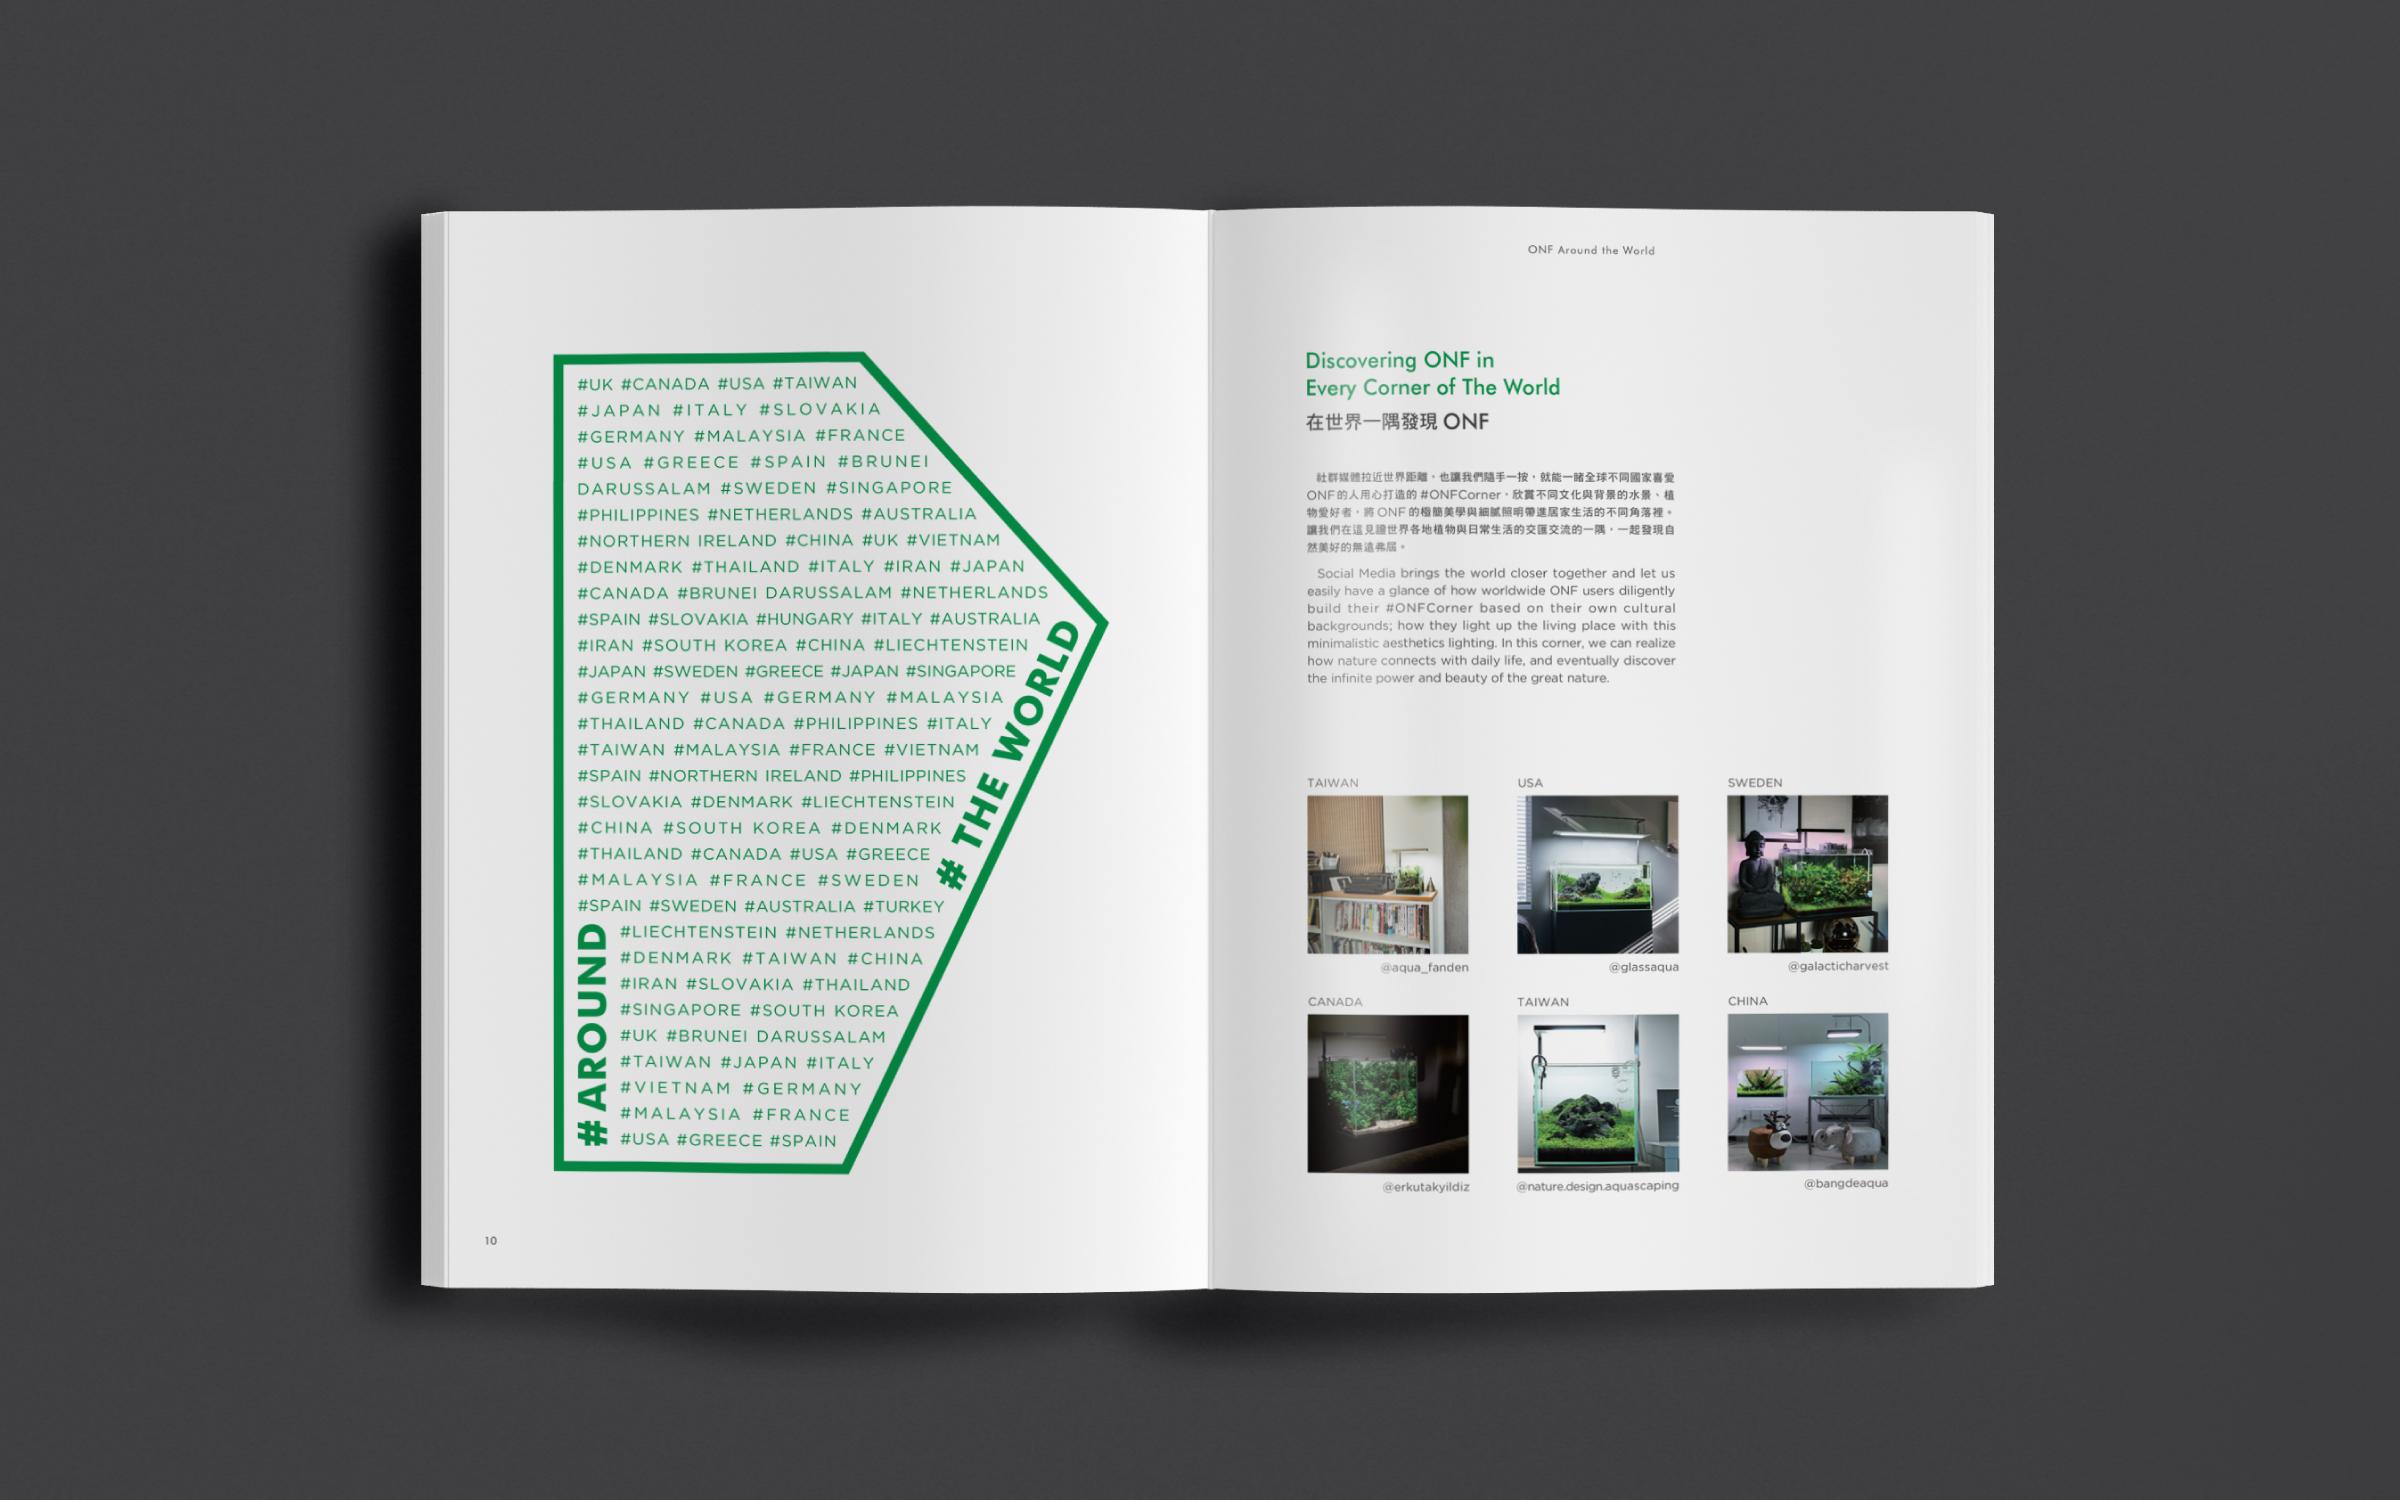 ONF_Book_Slide_03.jpg